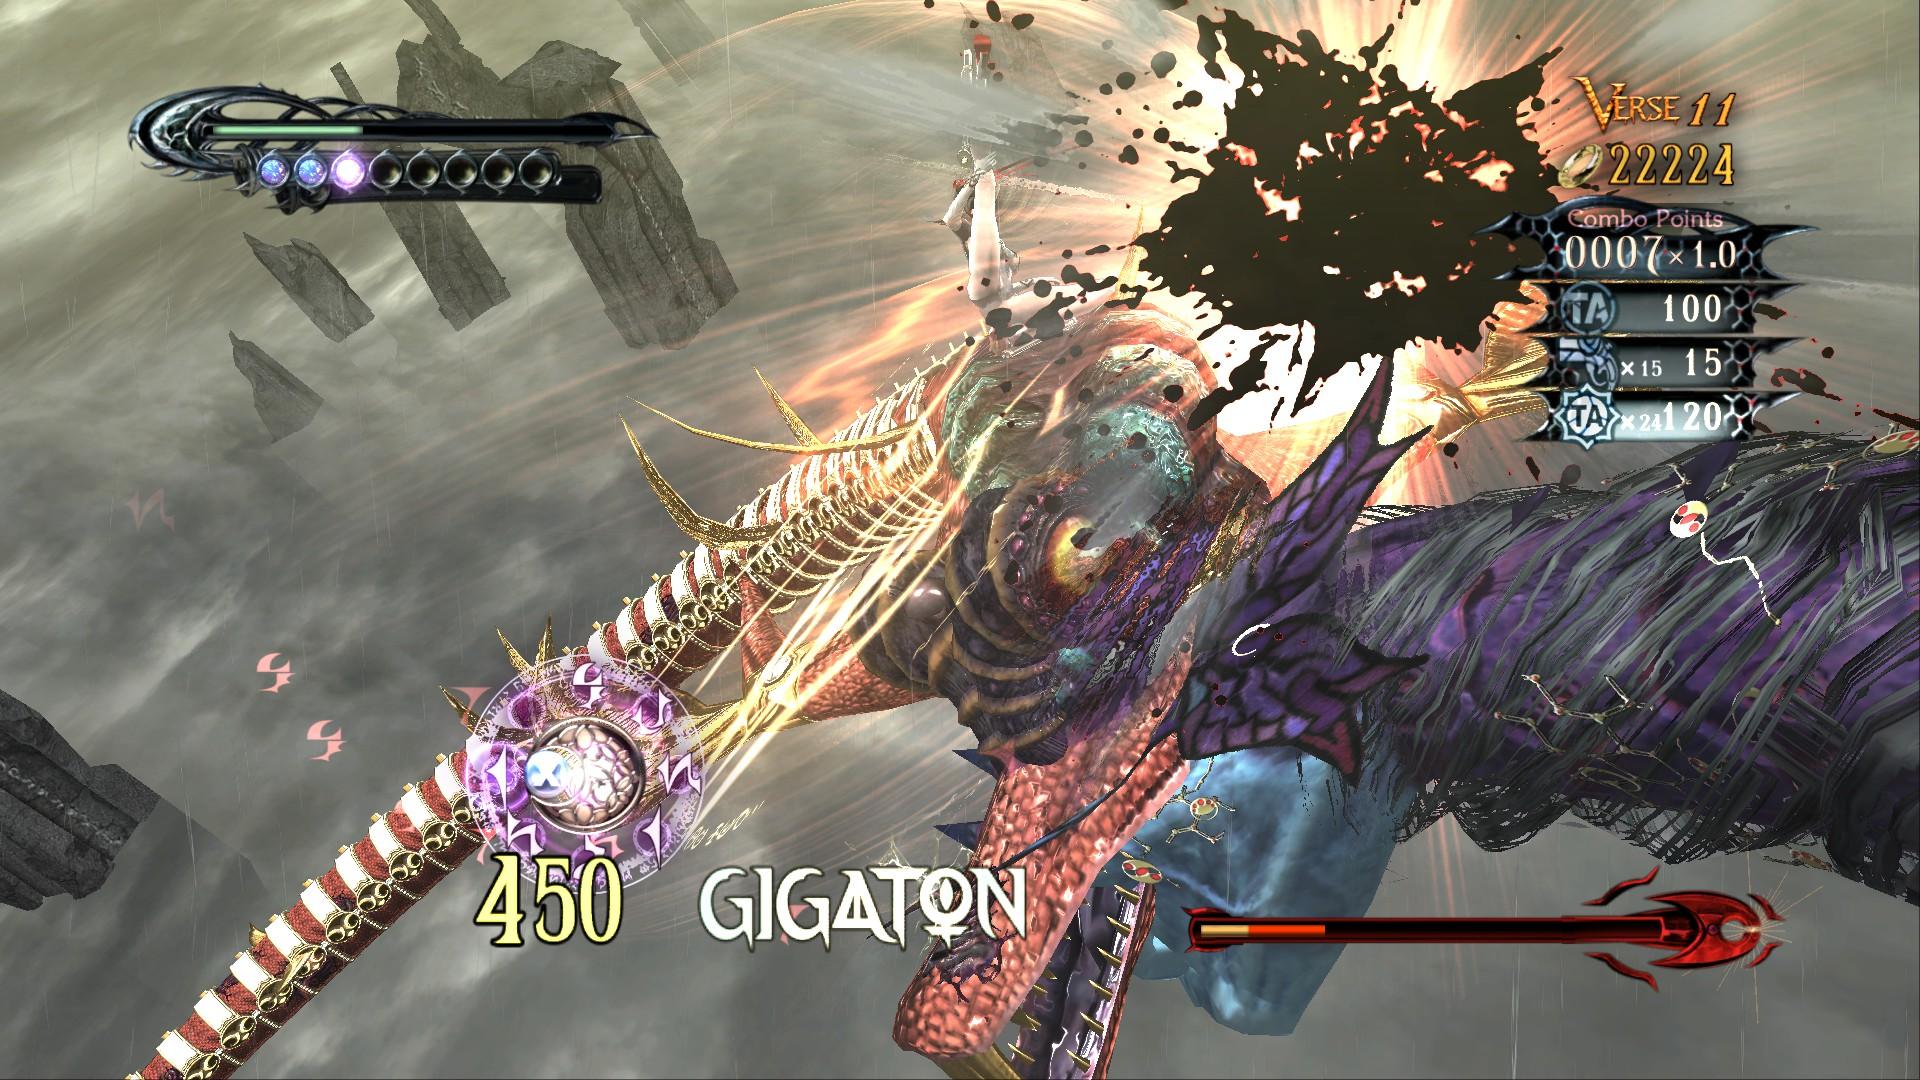 Bayonetta rozpoutala sexy peklo už i na PC 143111